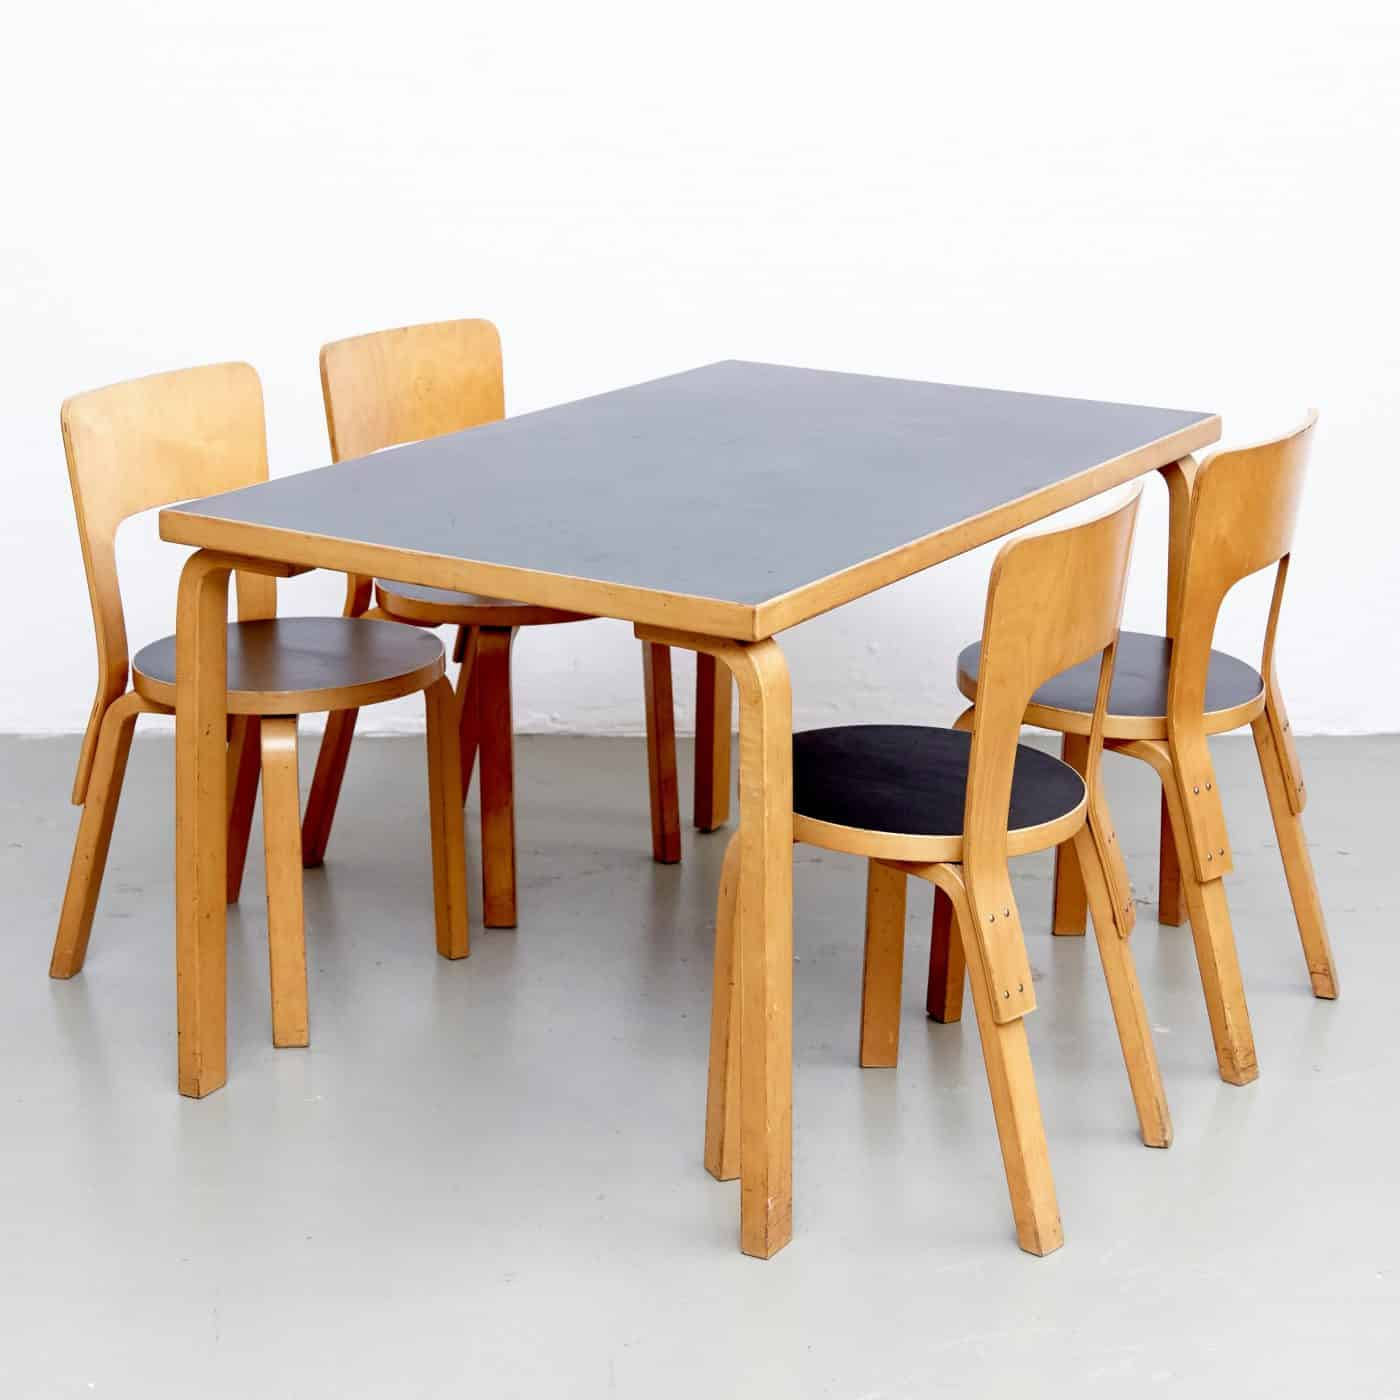 Alvar Aalto's 1970S DINING SET, offered by DADA Studios